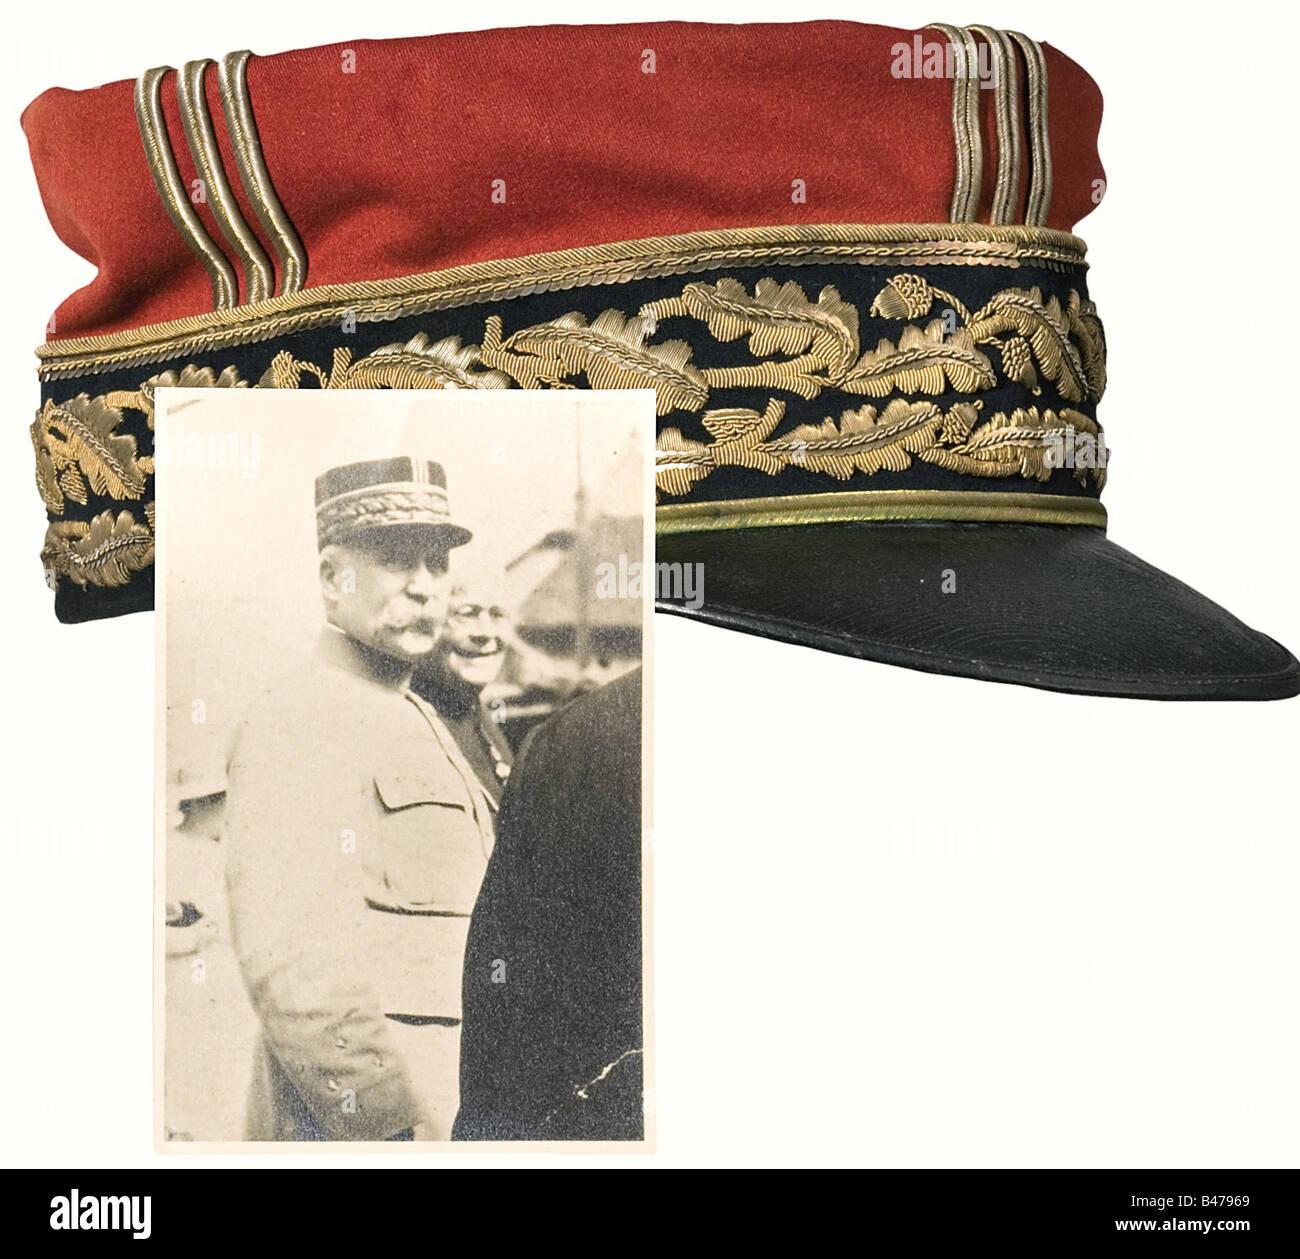 Philippe Pétain - Képi as Général de Division (Major General)., A black band with two rows of - Stock Image